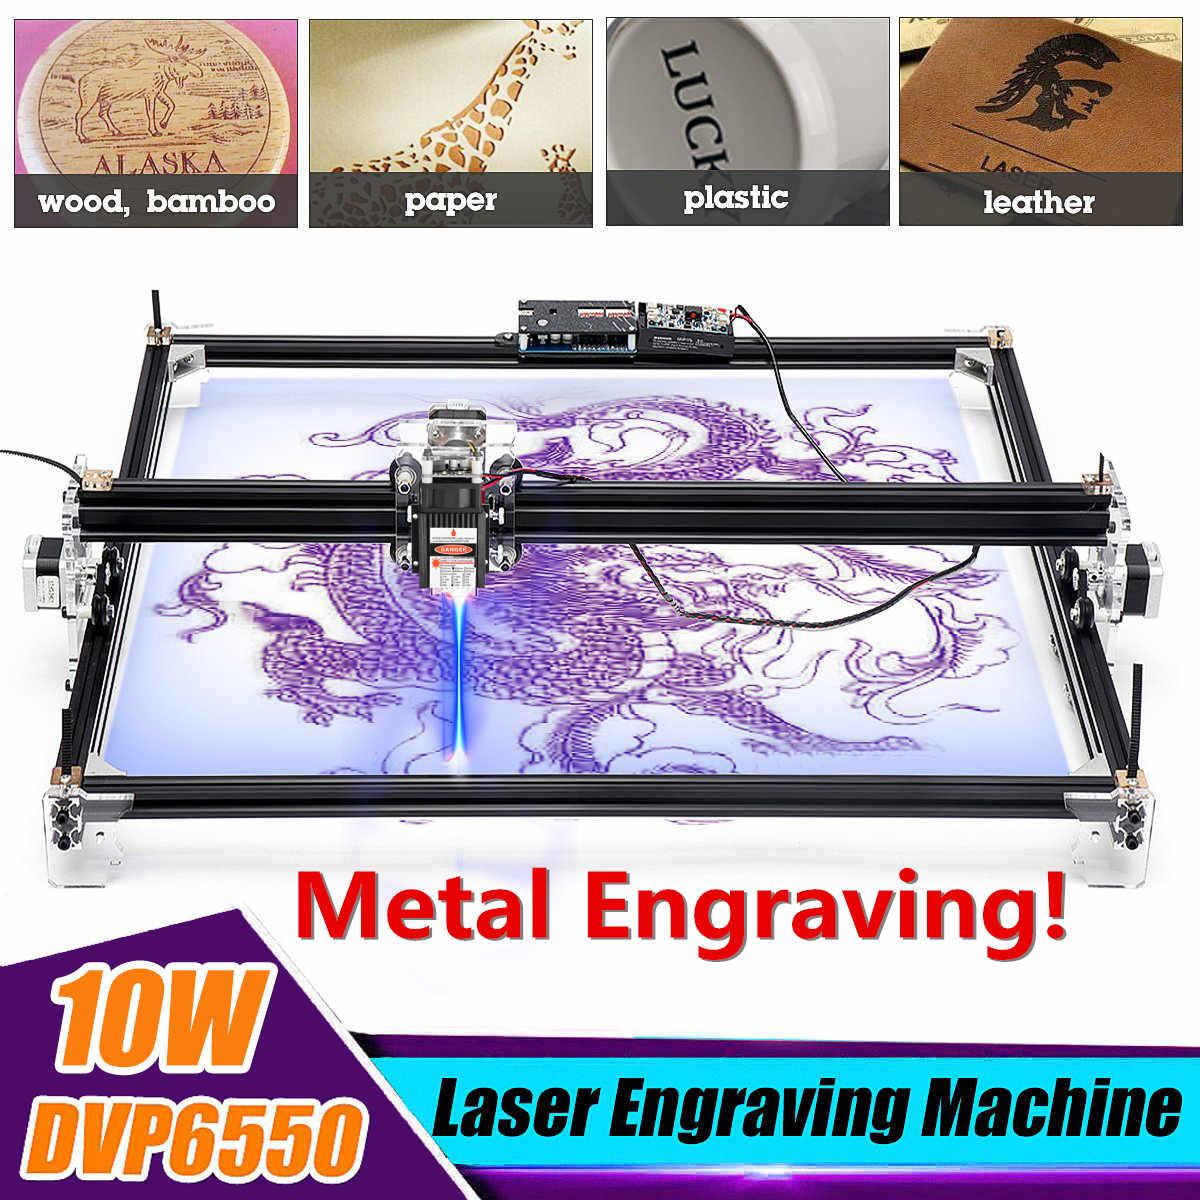 65*55cm Mini 10W Metal /5500MW Blue CNC Laser Engraving Machine 2 Axis 12V DIY Home Engraver Desktop Wood Router/Cutter/Printer